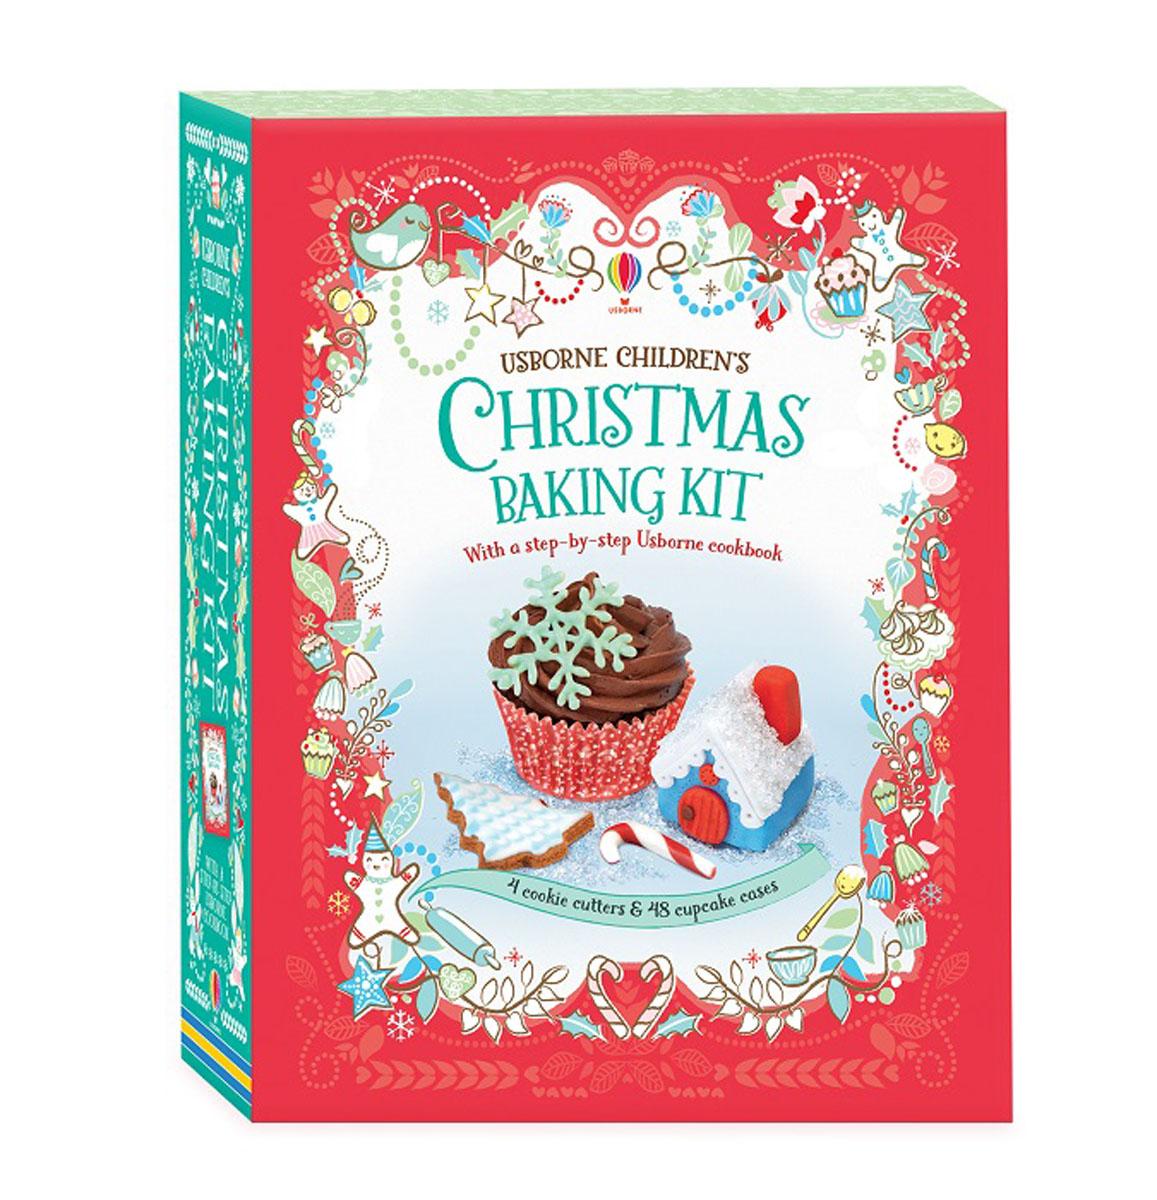 Abigail Wheatley, Fiona Patchett. Children's Christmas Baking Kit